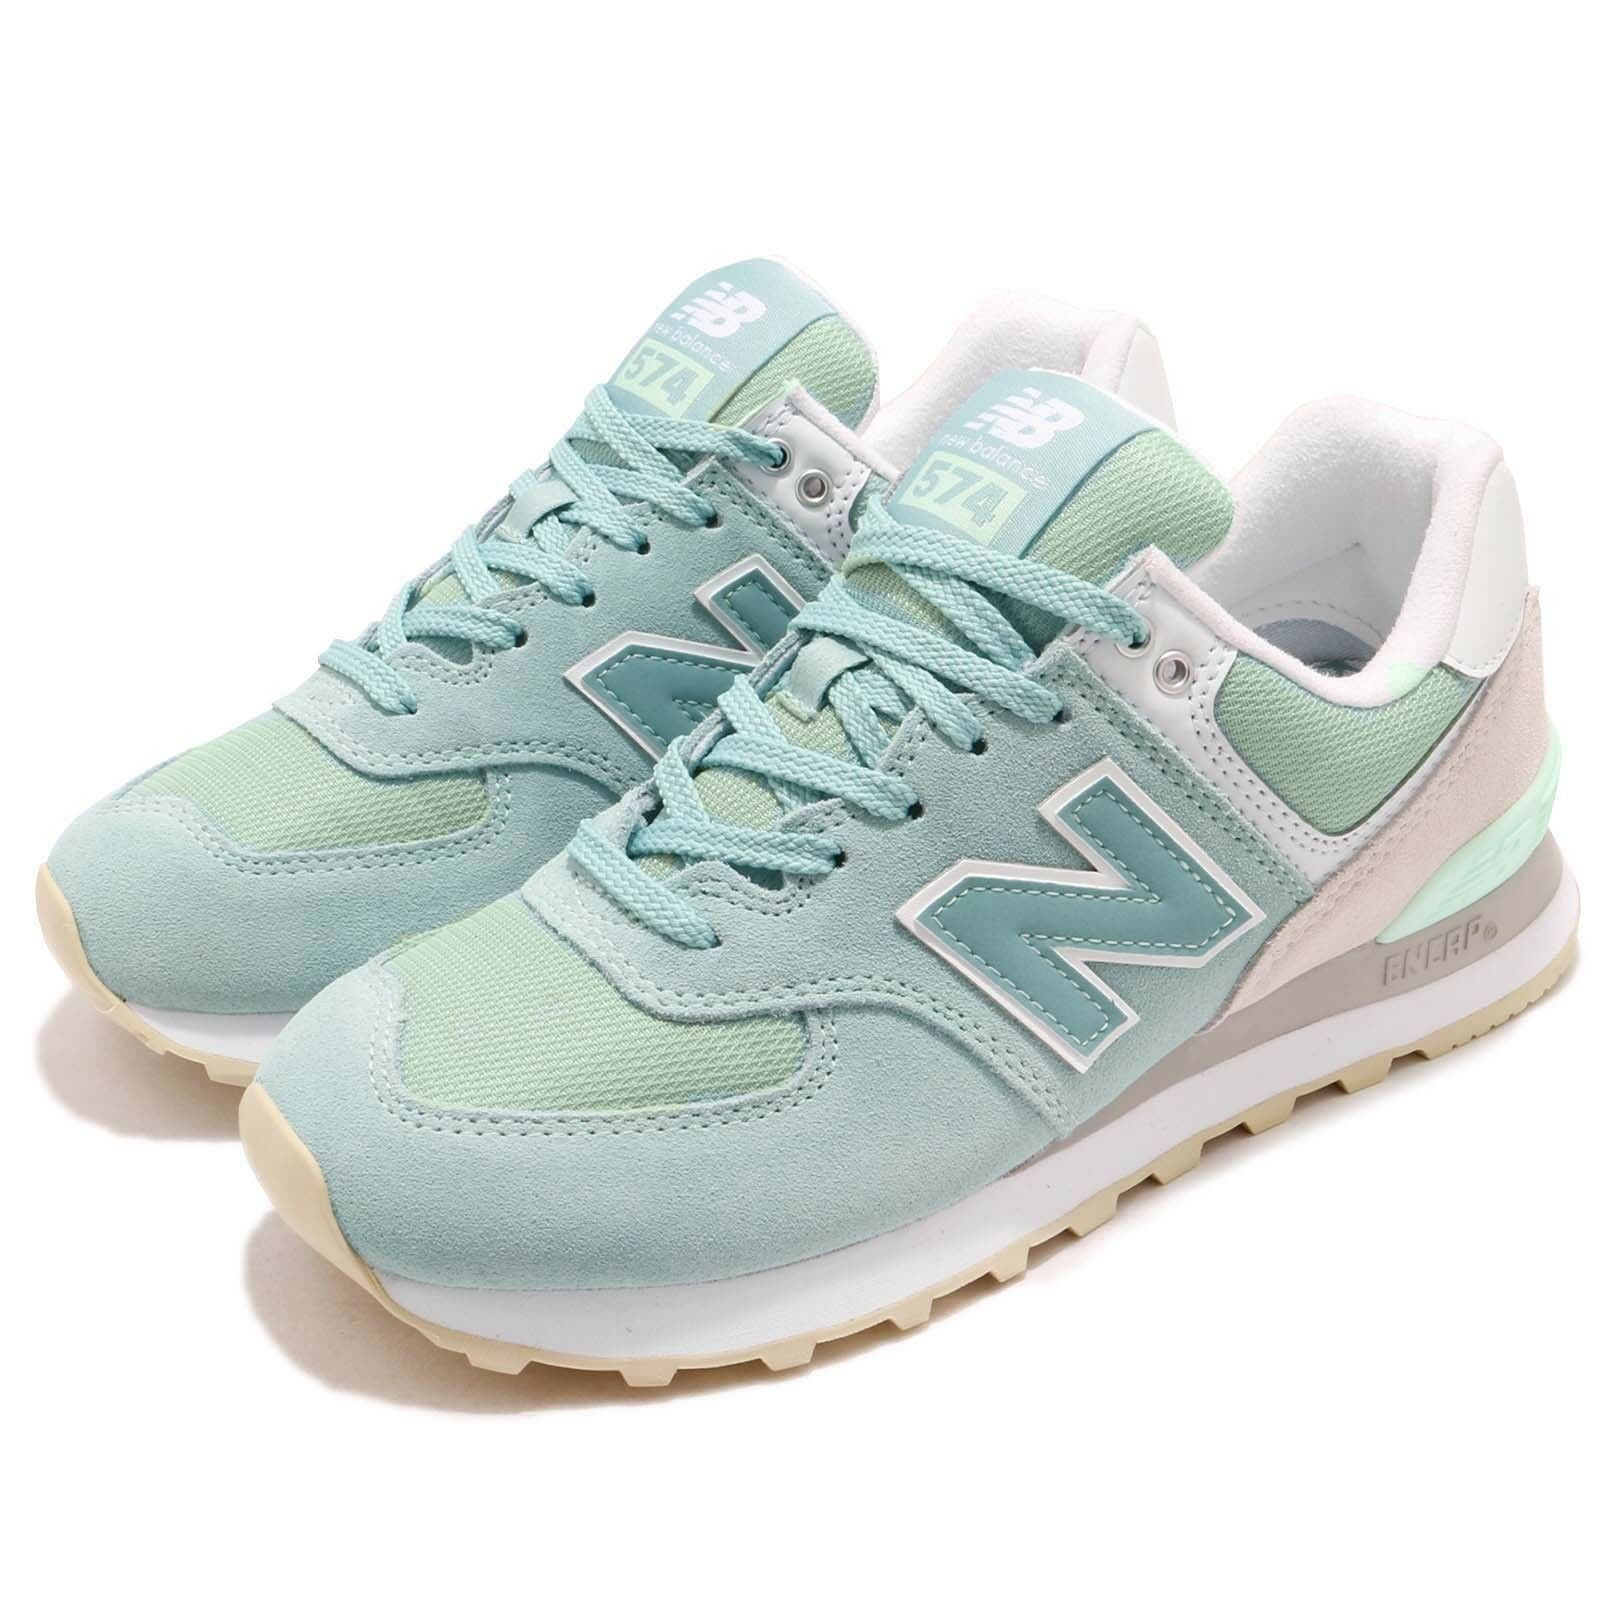 Nuovo equilibrio W574TAB B Bianco  Bianco Bianco Bianco Bianco Scarpe scarpe da ginnastica W574TAB  consegna gratuita